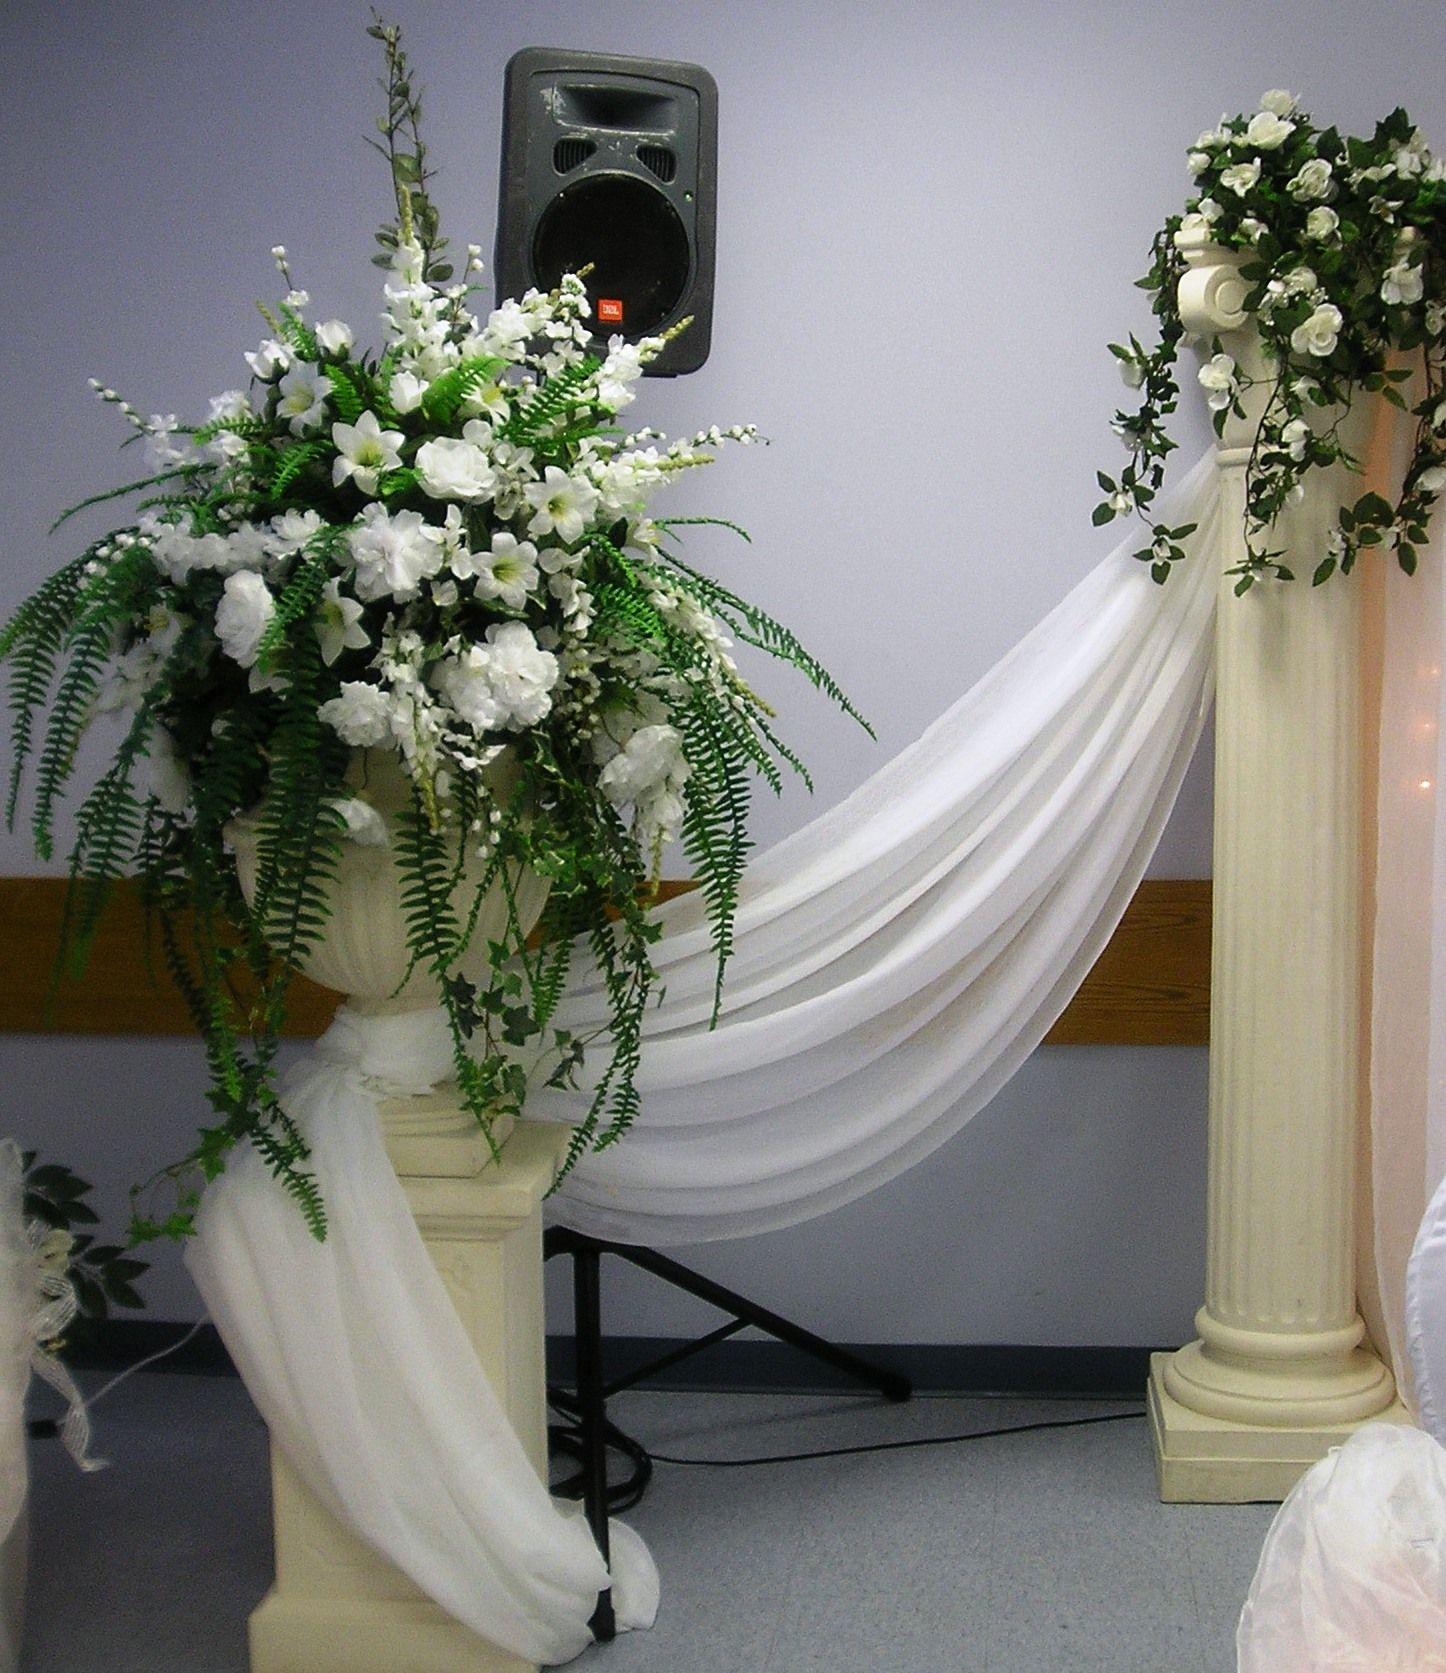 Floral Urns For Weddings: White Floral Arrangement In